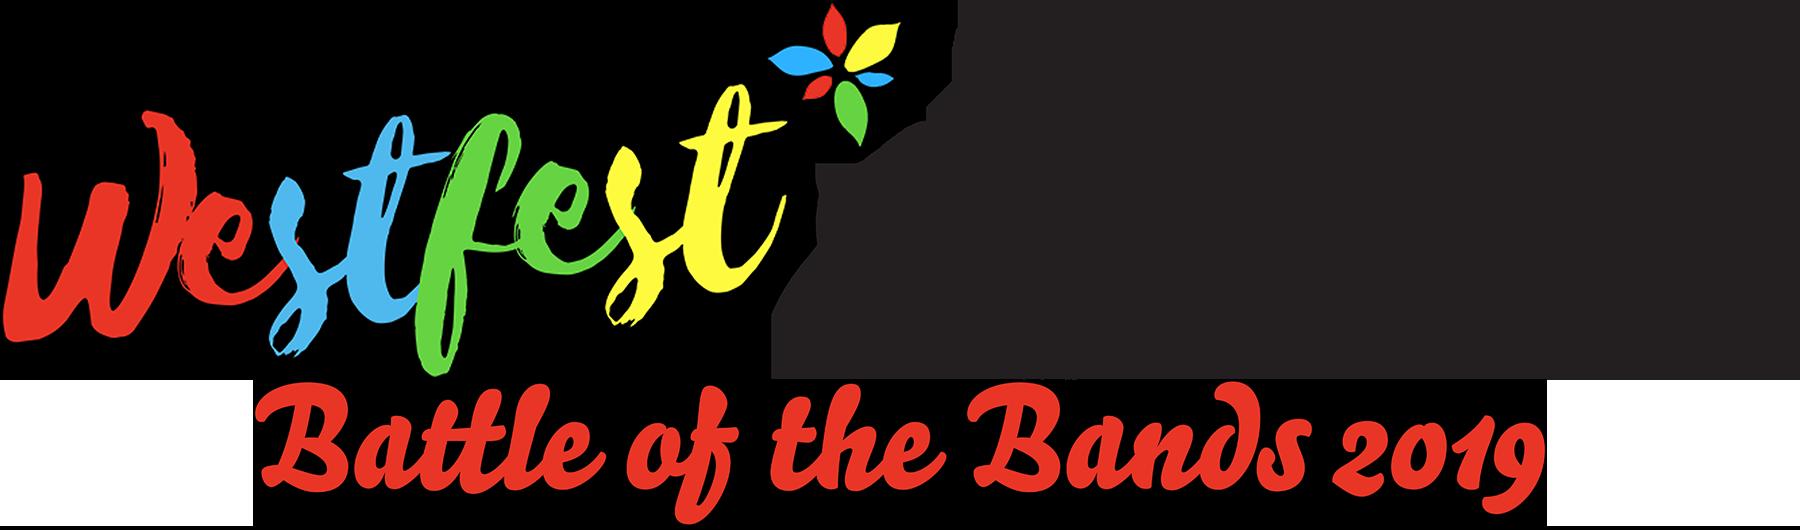 Kirkcaldy Heat 1 - WestFest & EH6 BOTB 2019